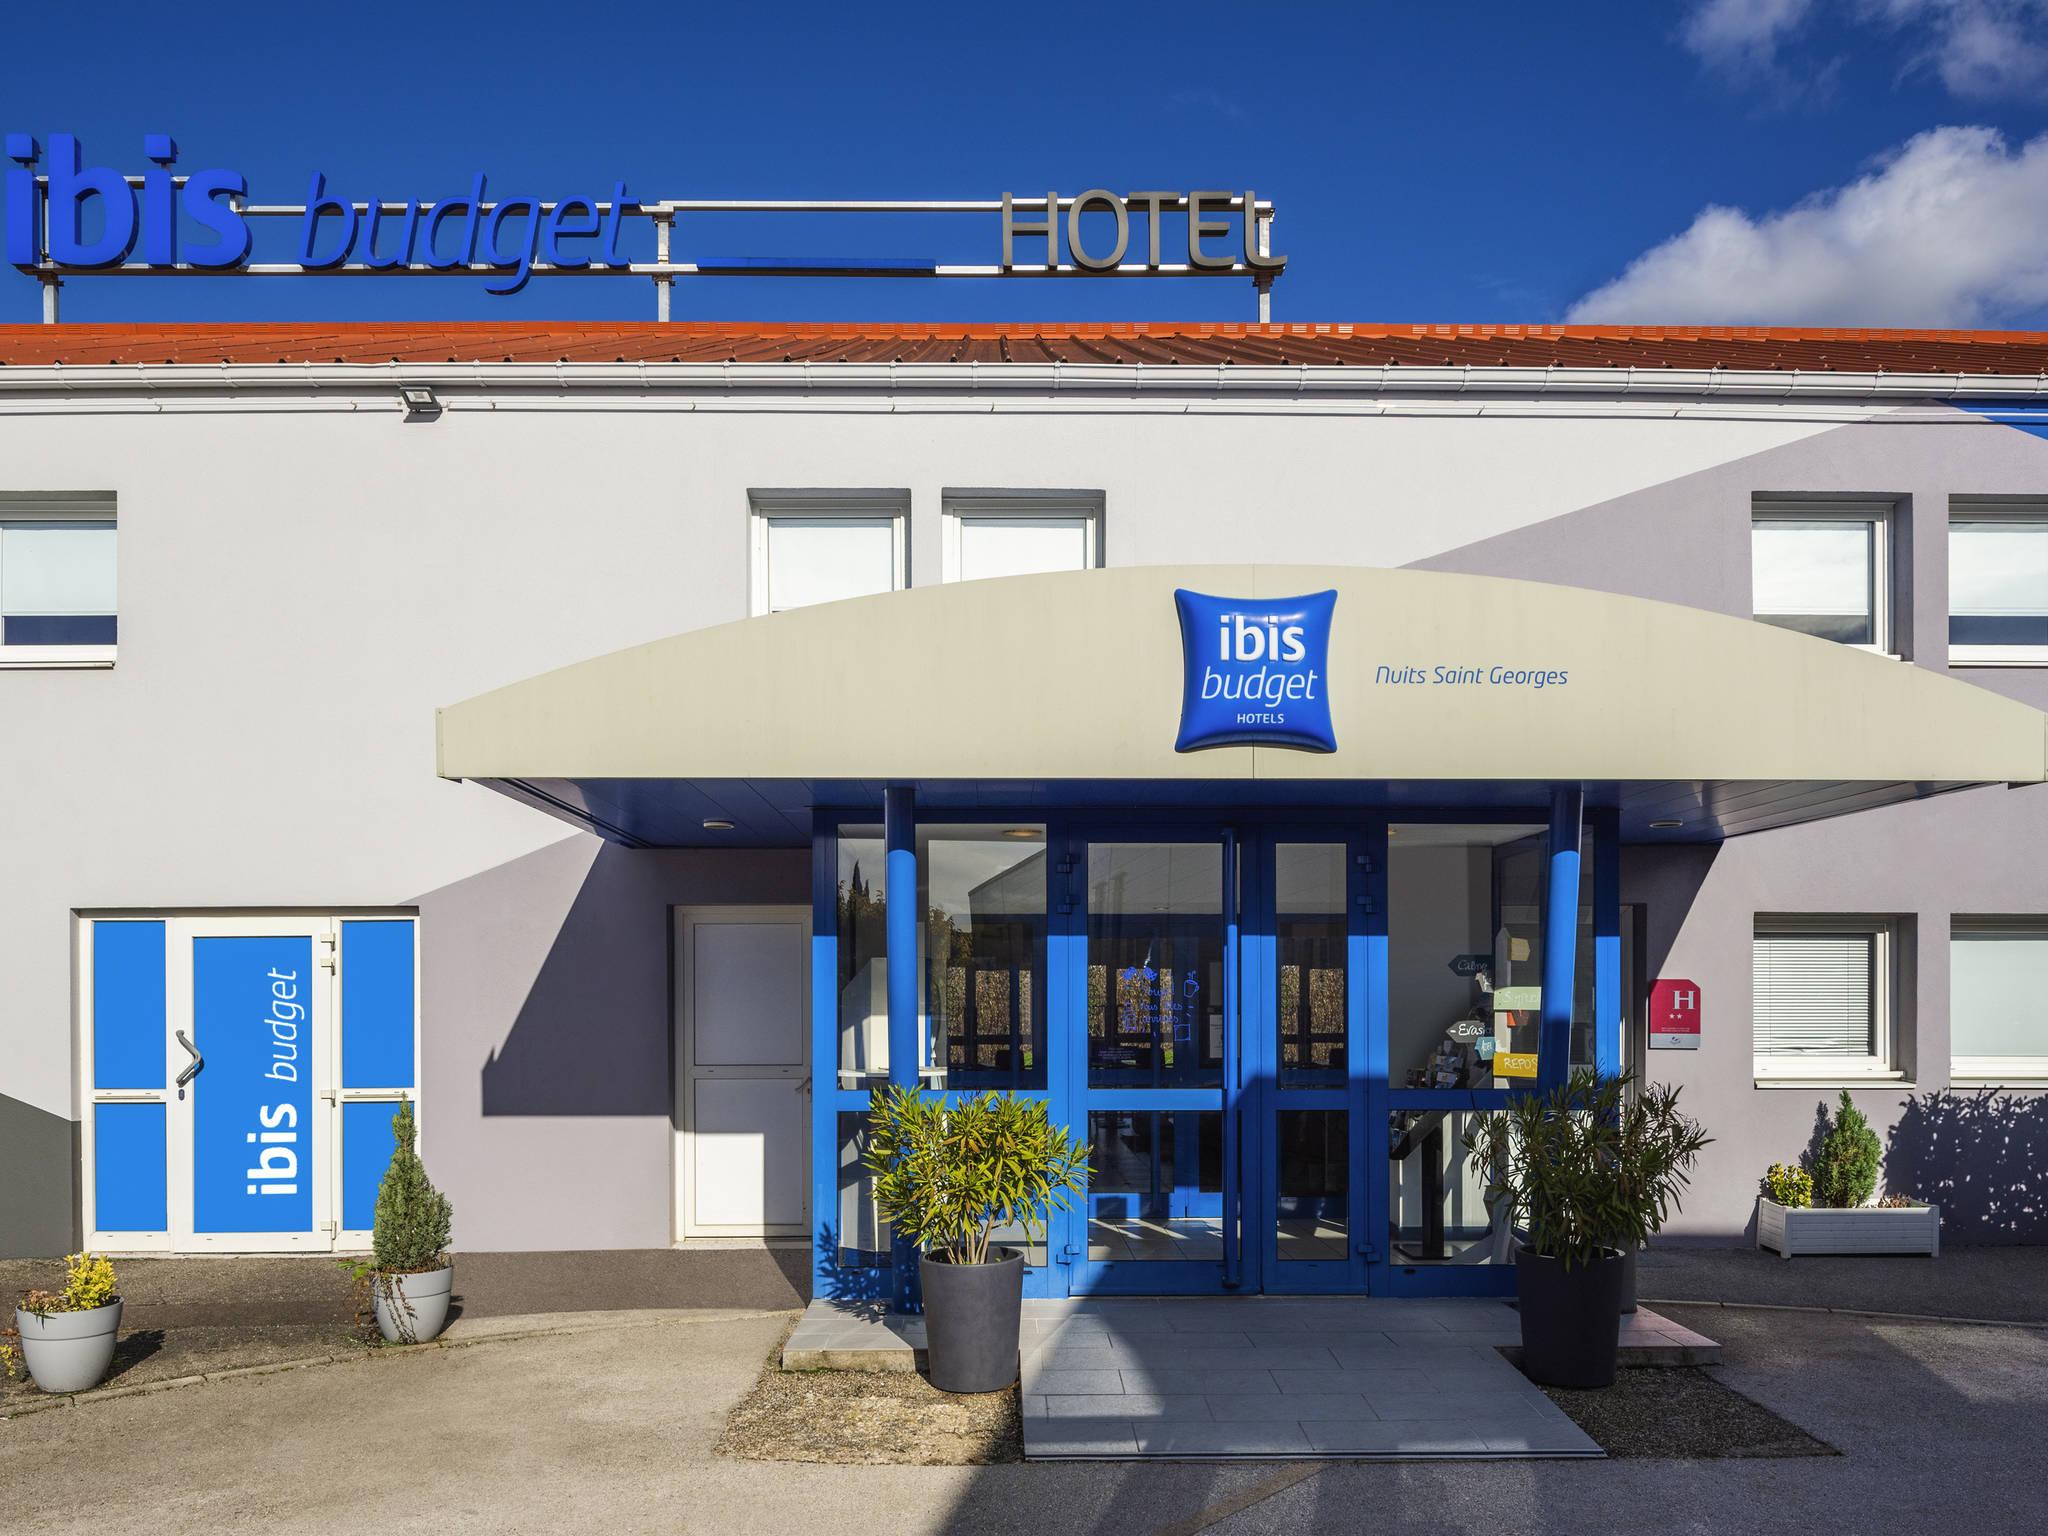 فندق - ibis budget Nuits-Saint-Georges